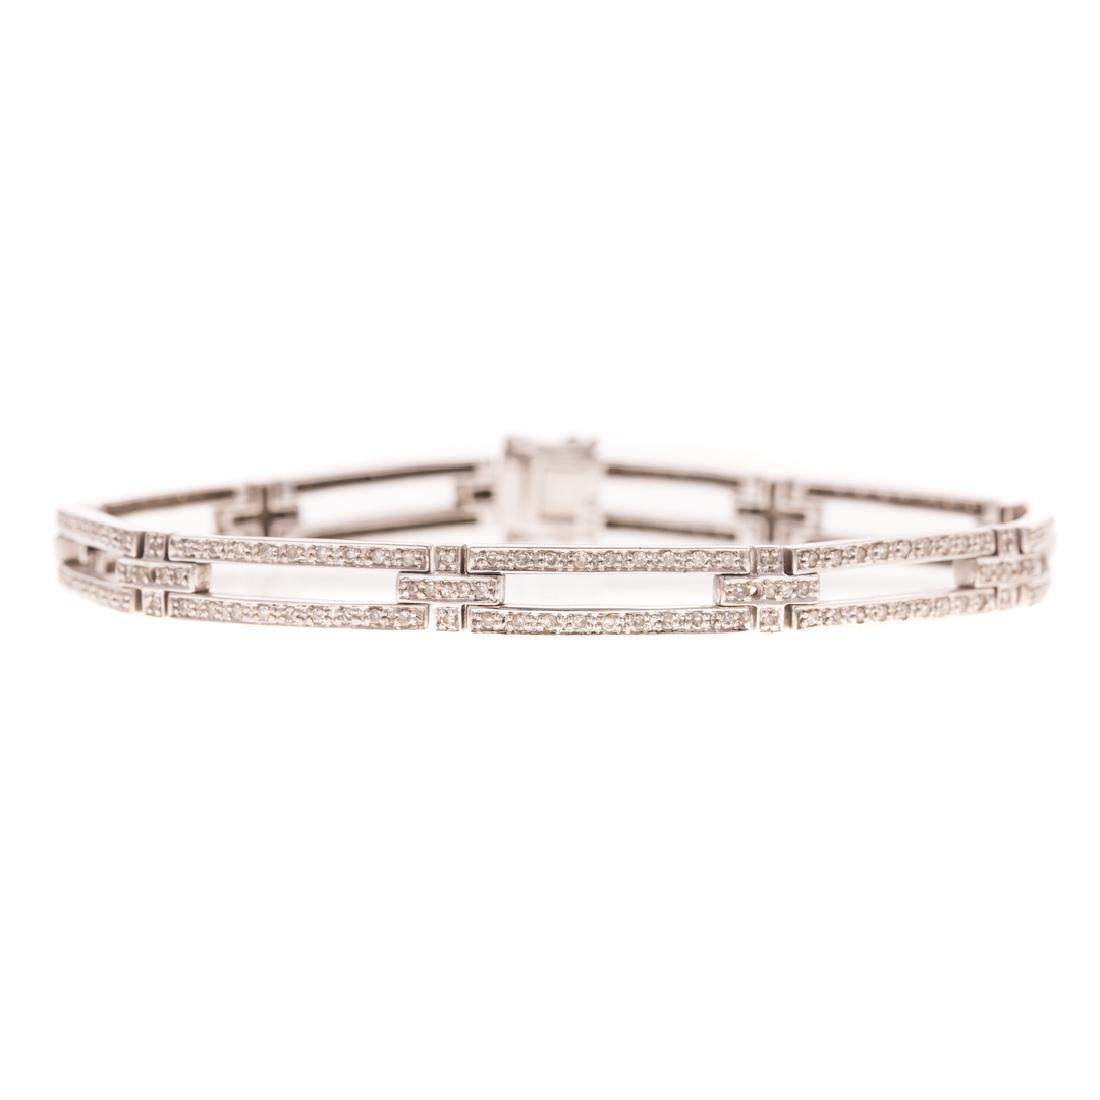 A Lady's White Gold Diamond Bracelet & Ring - 2